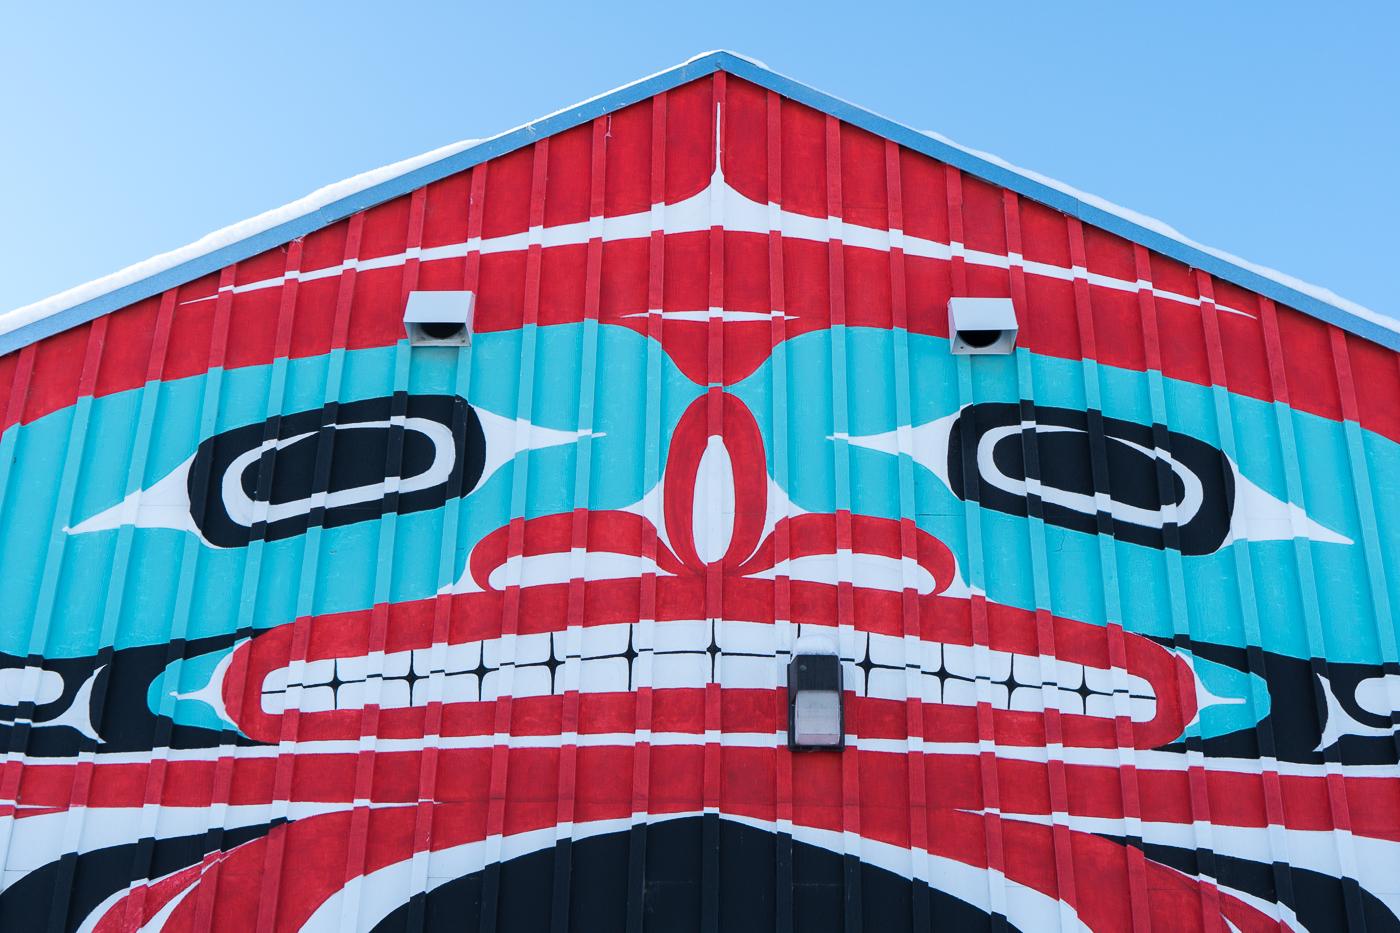 Art autochtone de Carcross, Yukon